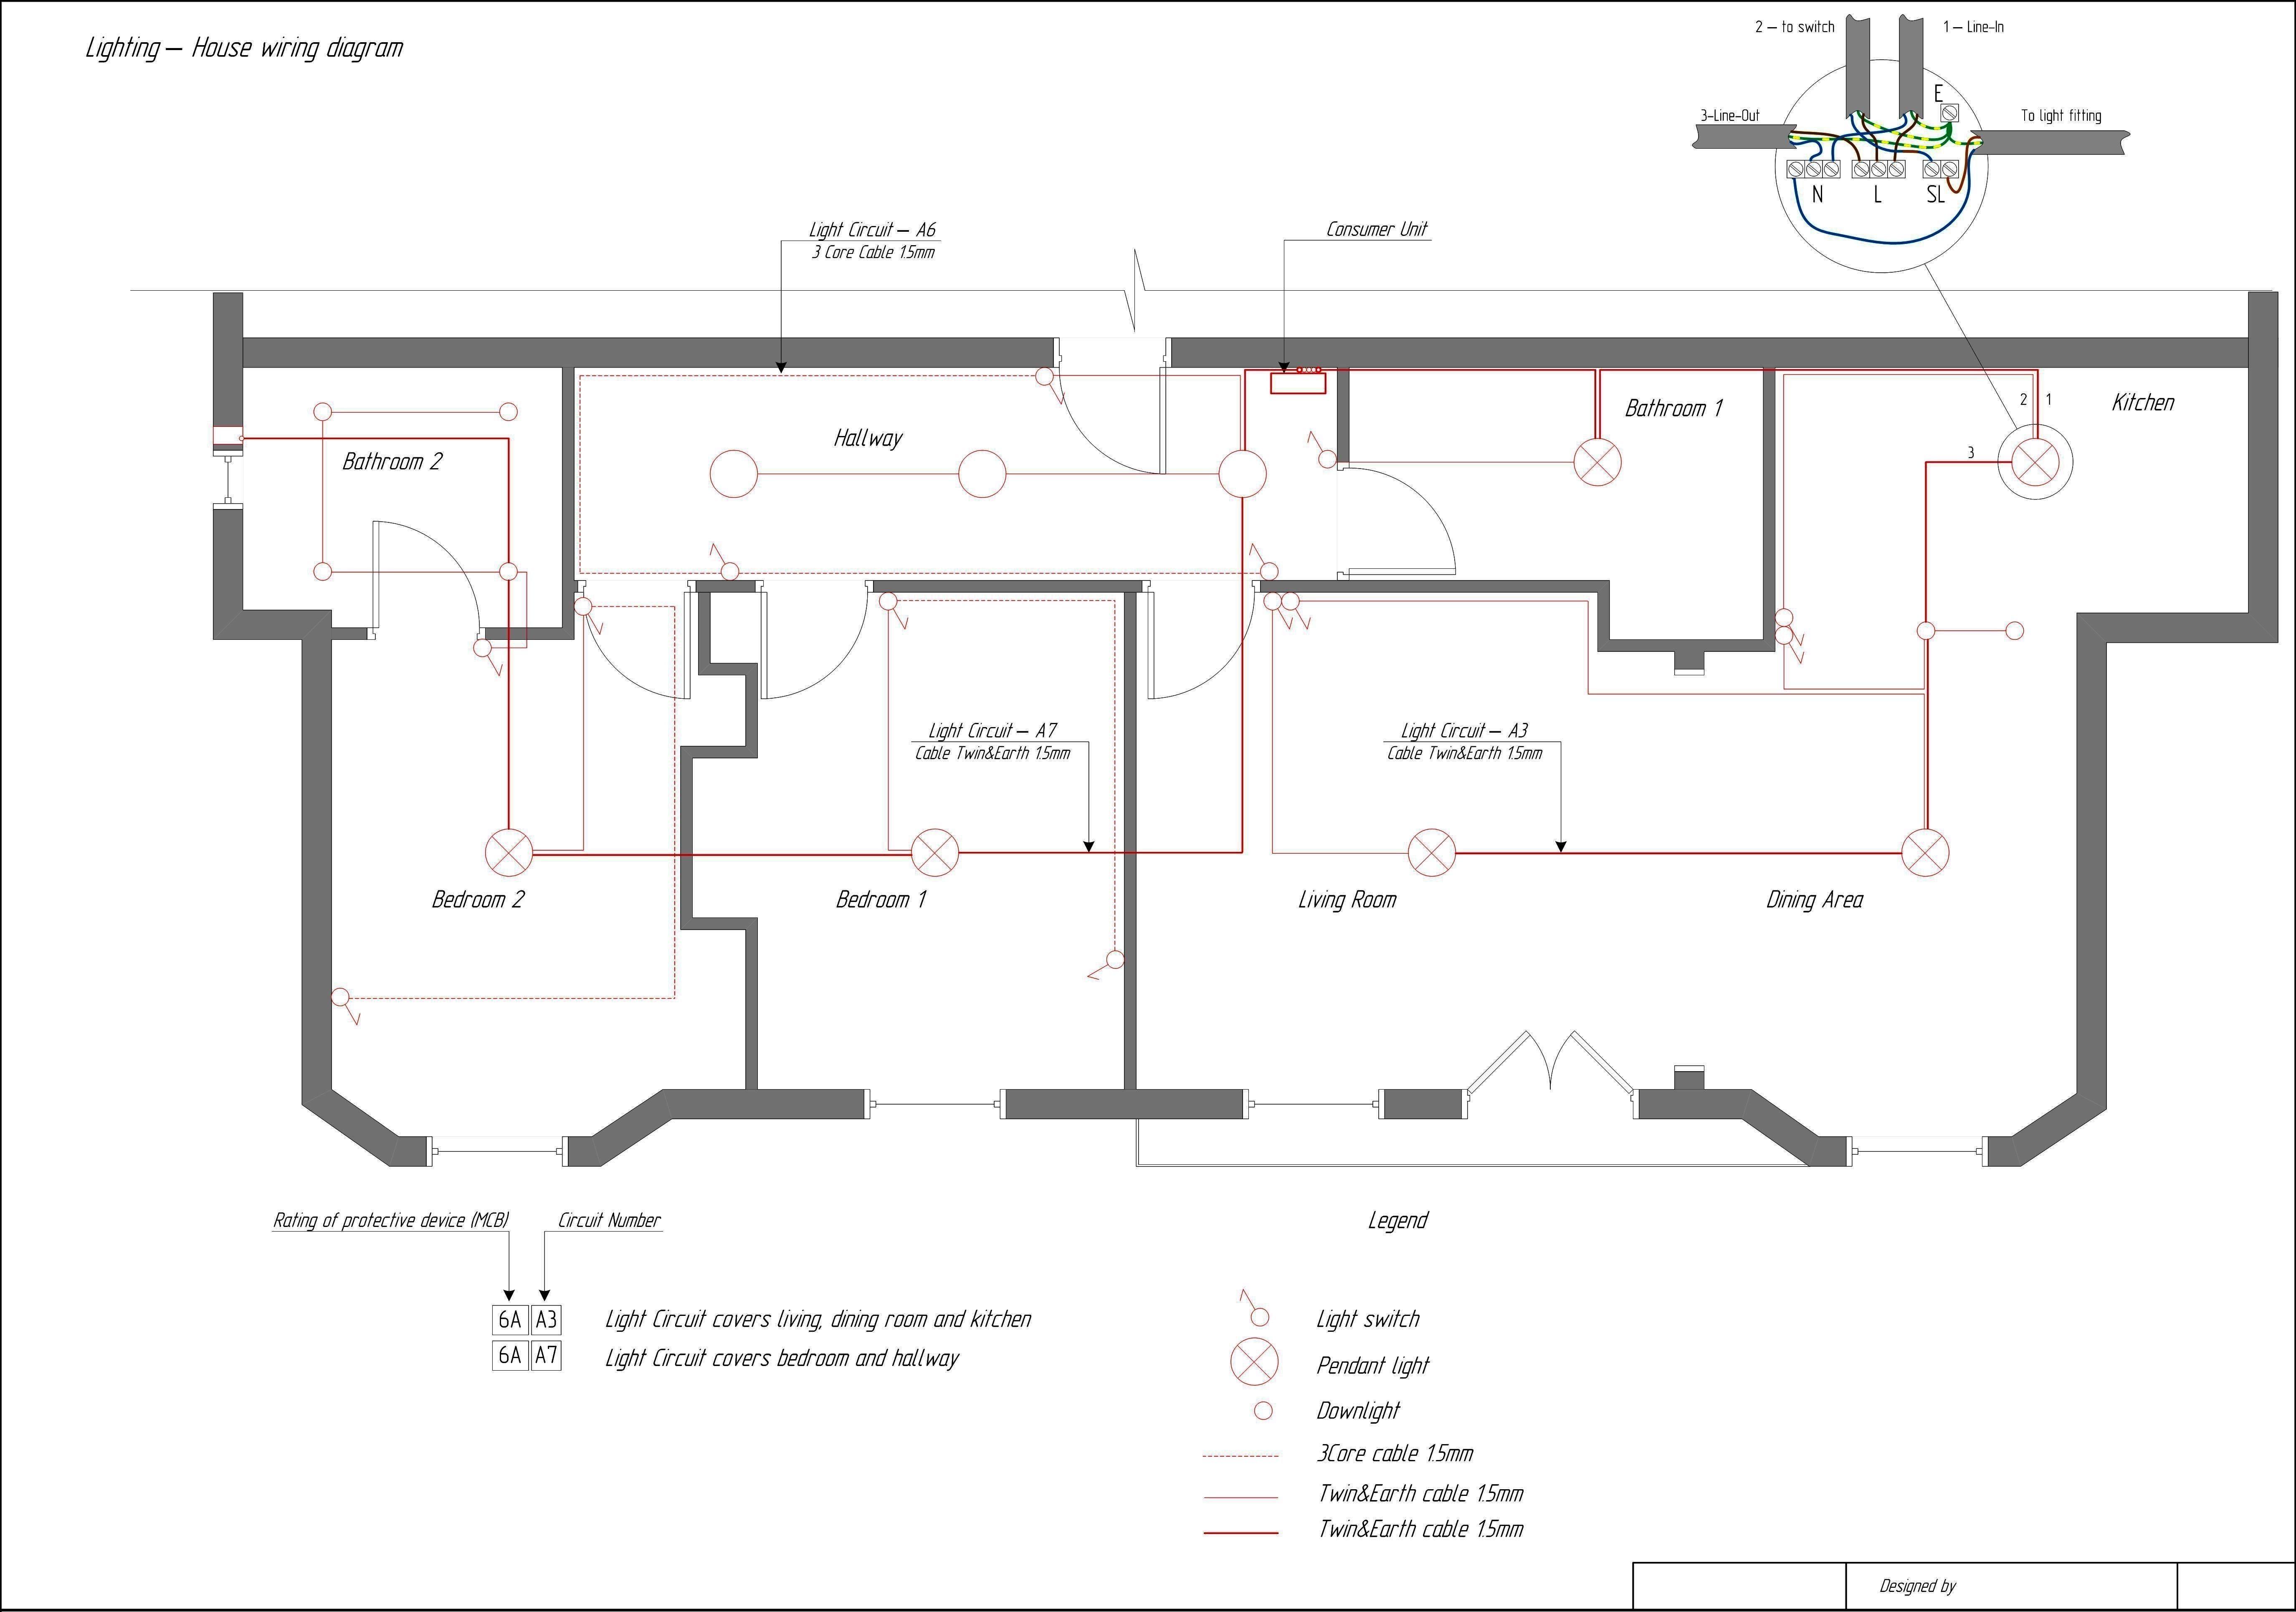 House Wiring Diagram Electrical Floor Plan 2004 2010 Bmw X3 E83 3 0d In 2020 House Wiring Home Electrical Wiring Electrical Circuit Diagram